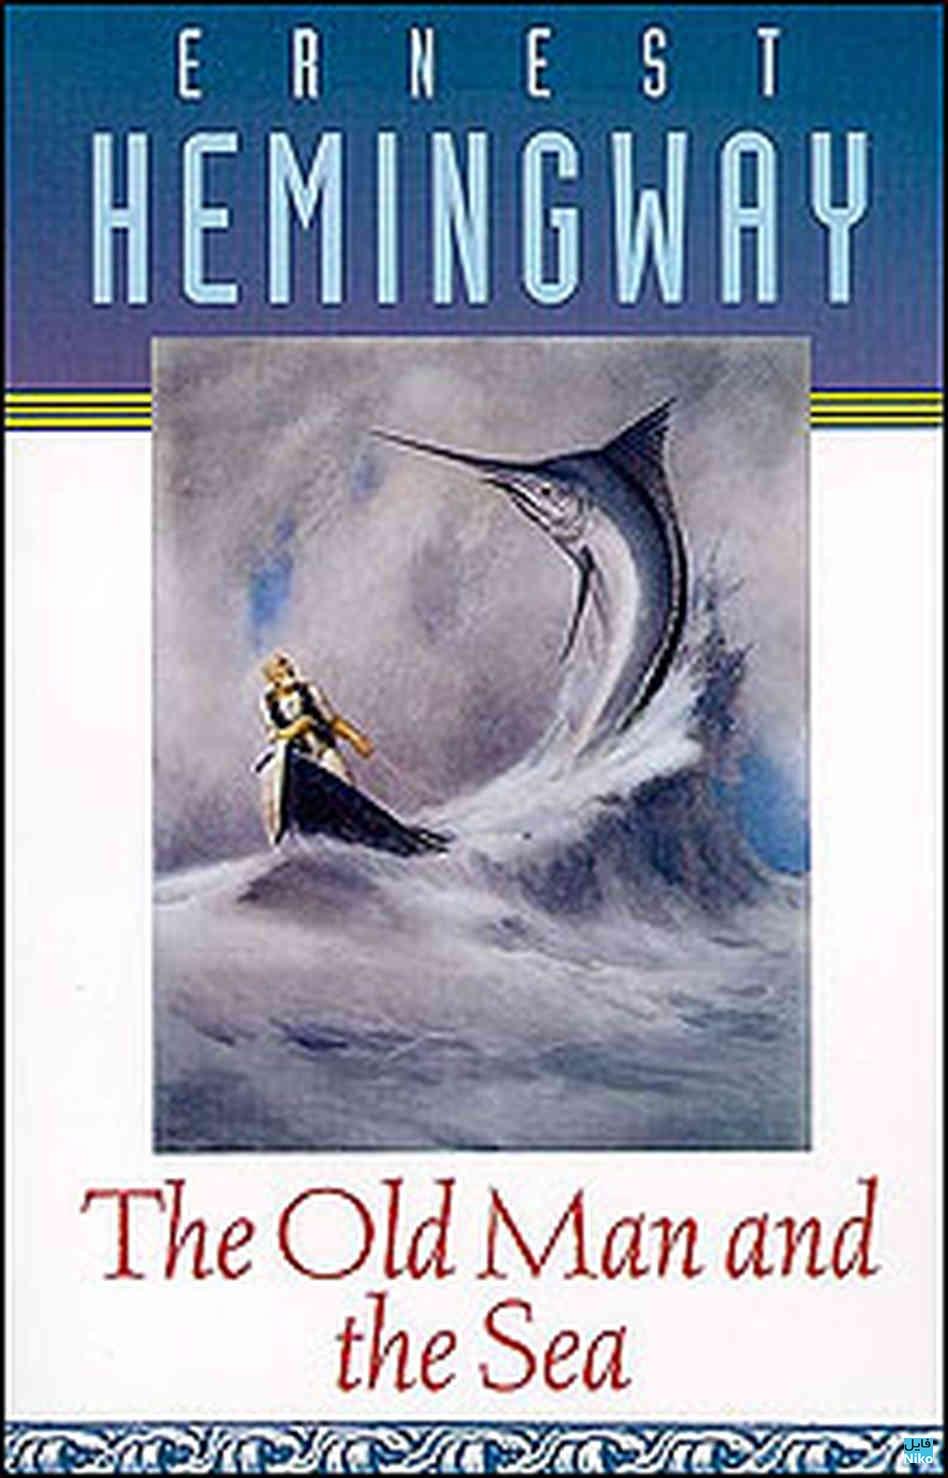 The Old Man and the Sea - دانلود انیمیشن کوتاه پیرمرد و دریا – The Old Man and the Sea